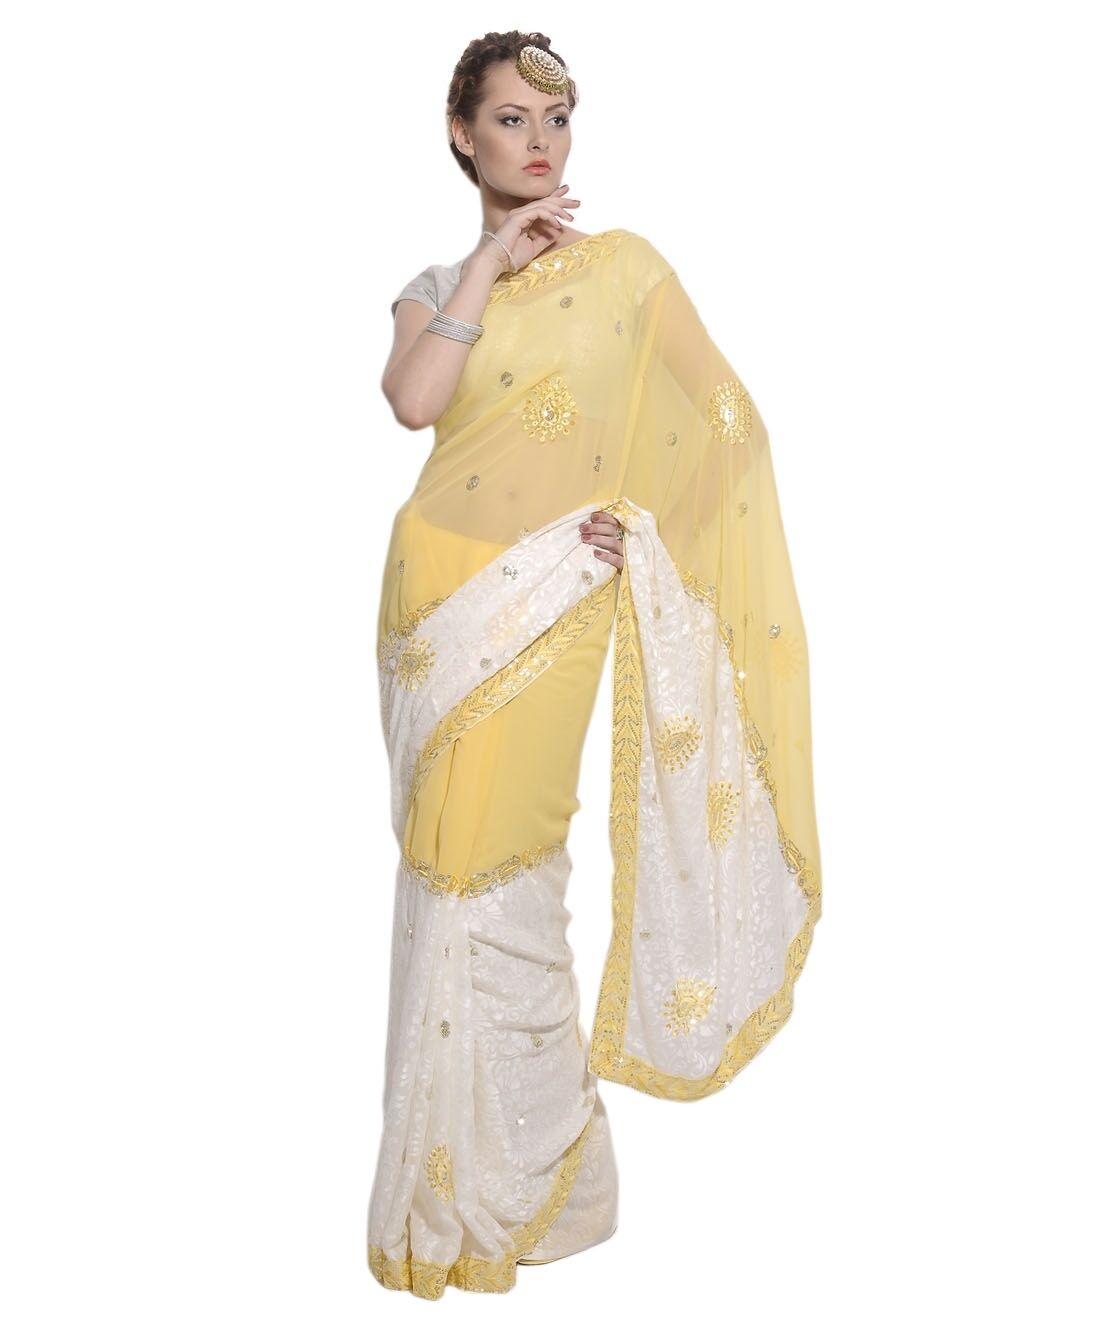 Trendy Exclusive Designer Sari Yellow Brasso Saree Designer Dress Indian Outfit